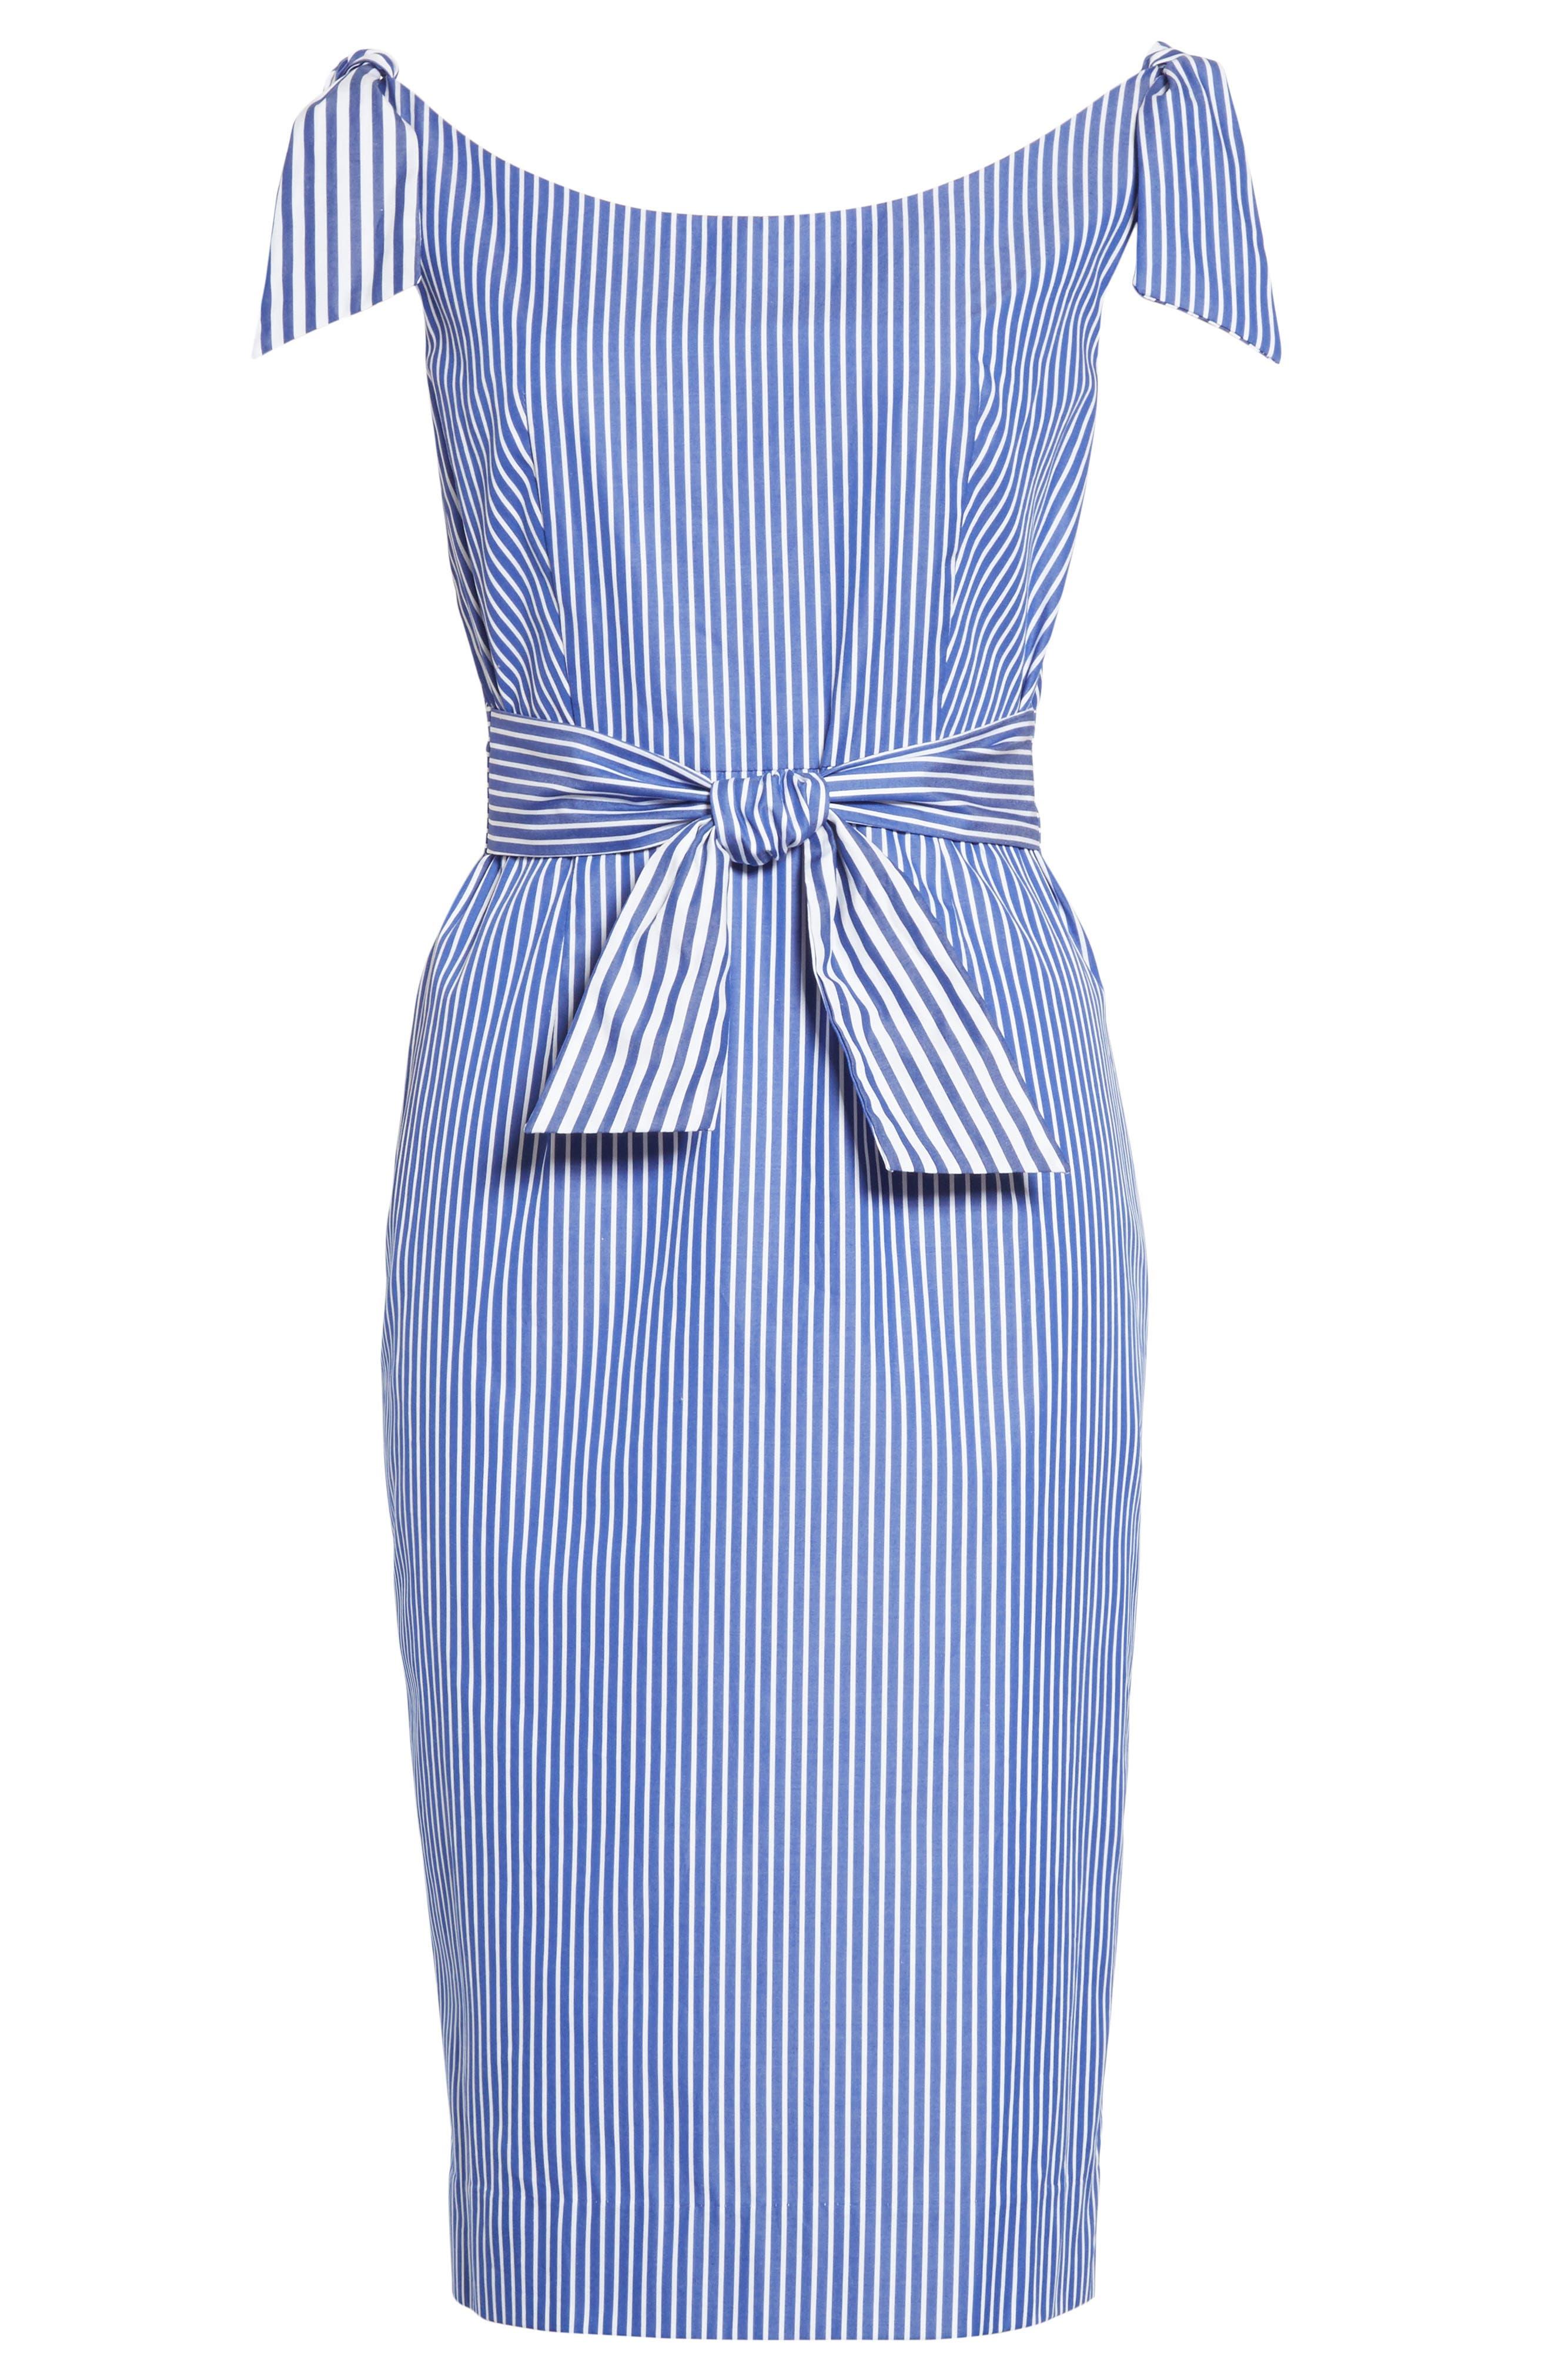 Candice Stripe Shirting Tie Dress,                             Alternate thumbnail 6, color,